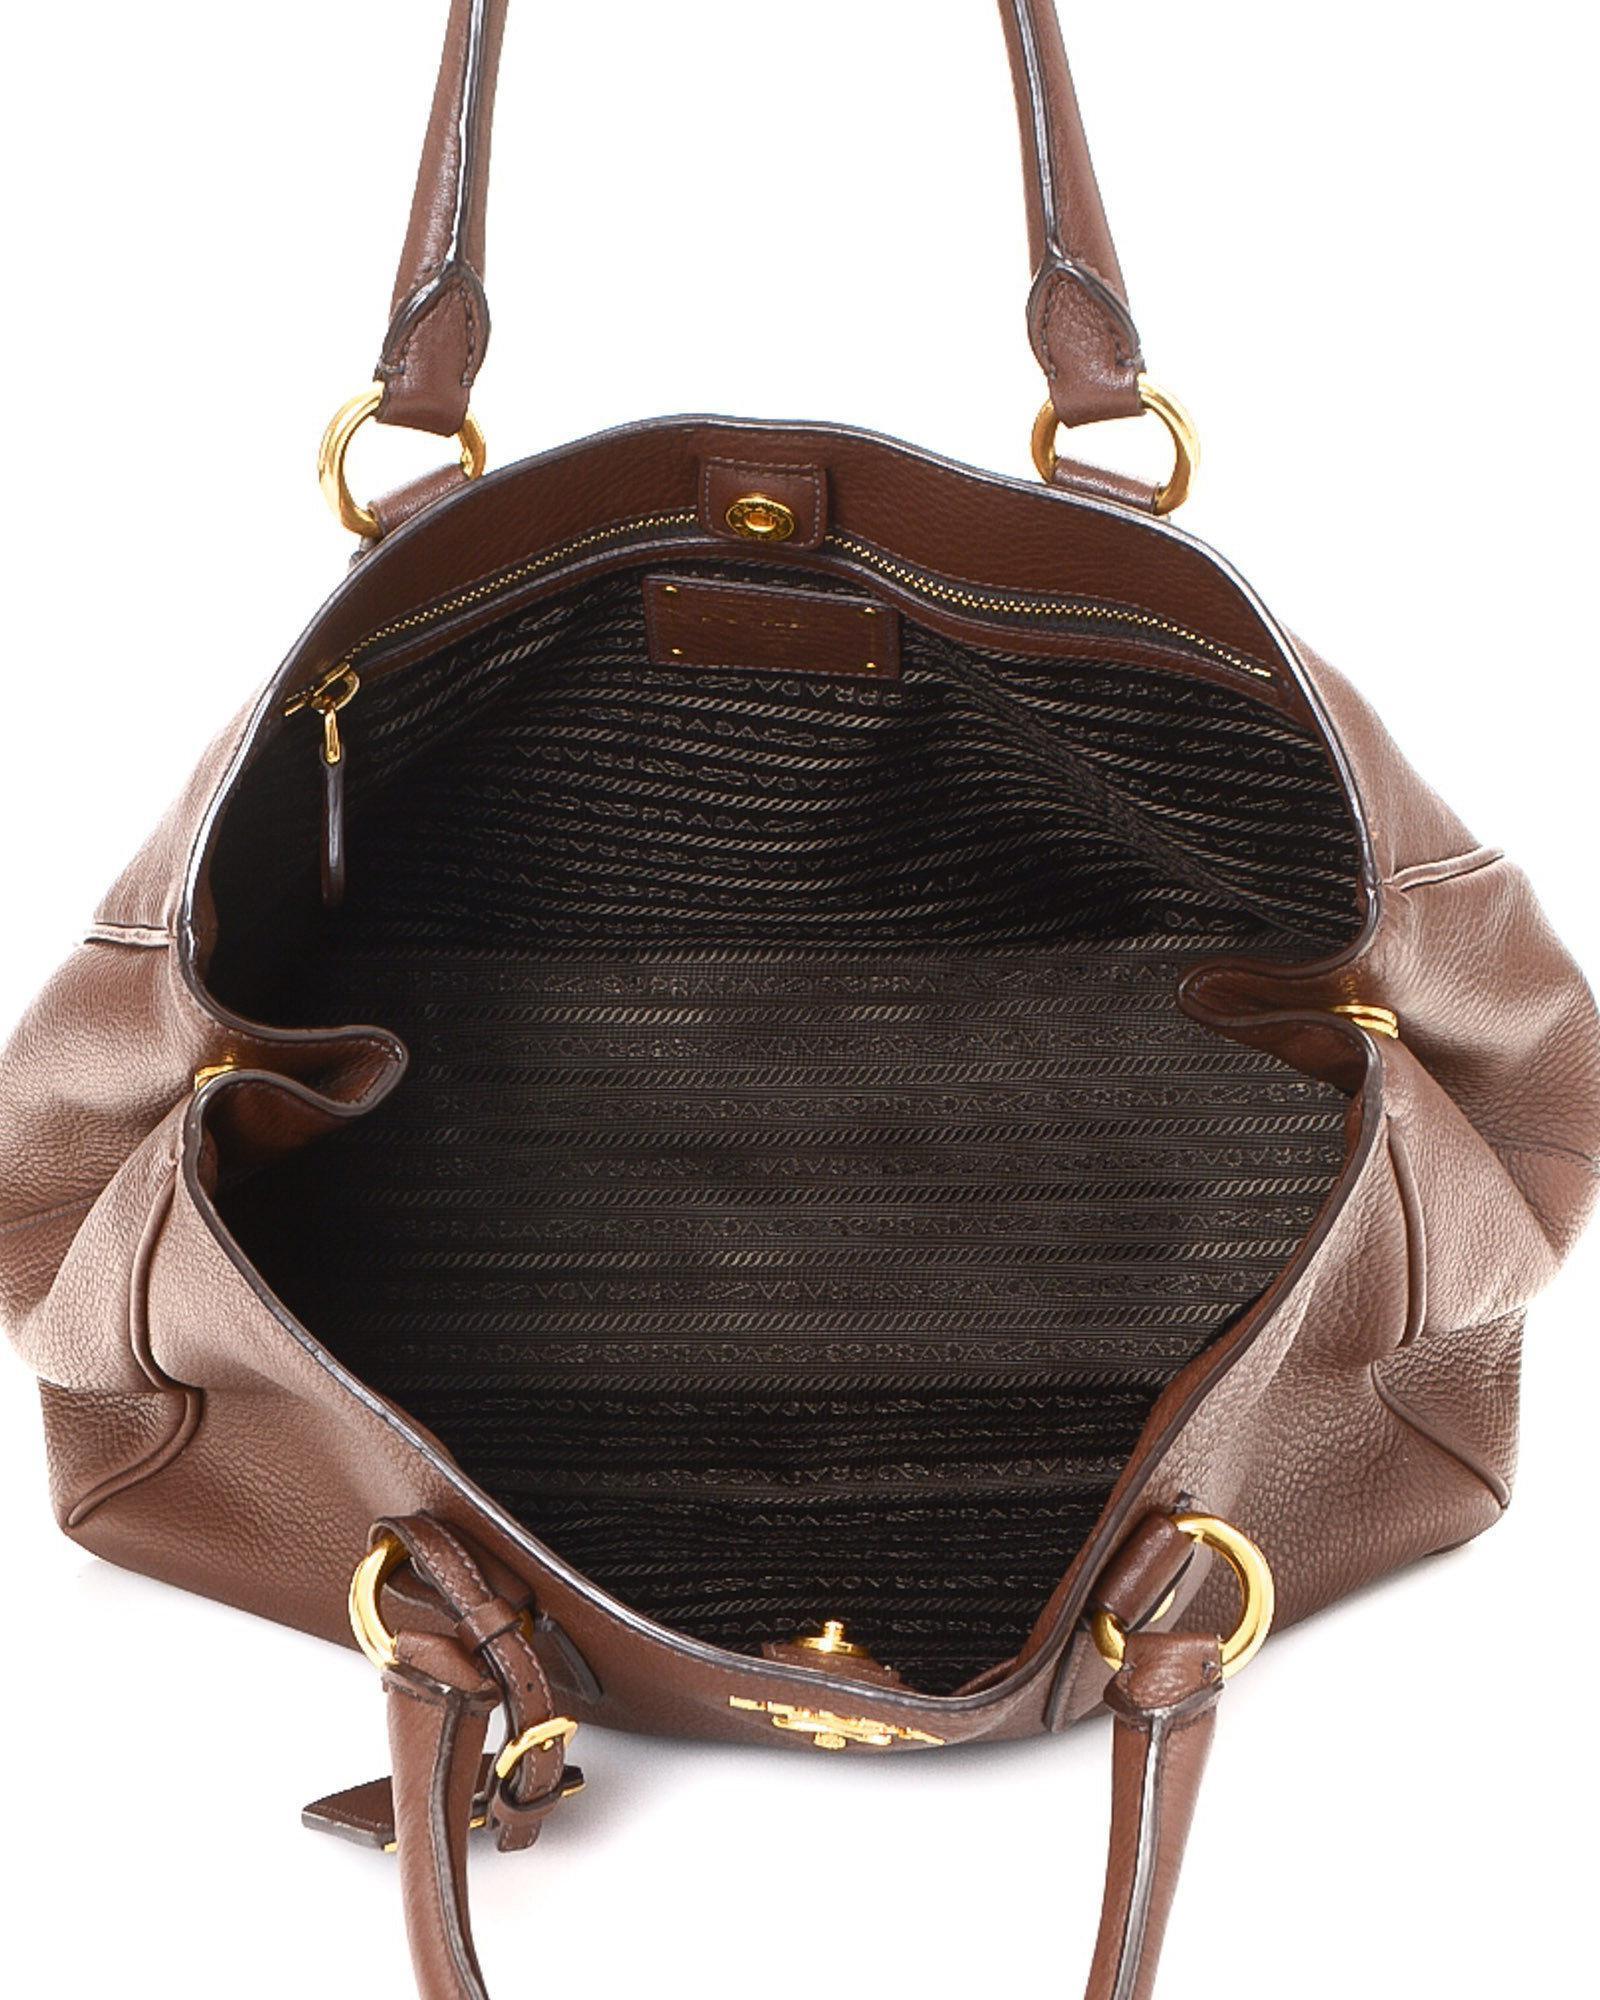 33a2e4af60fc ... wholesale lyst prada tote bag vintage in brown d1354 09850